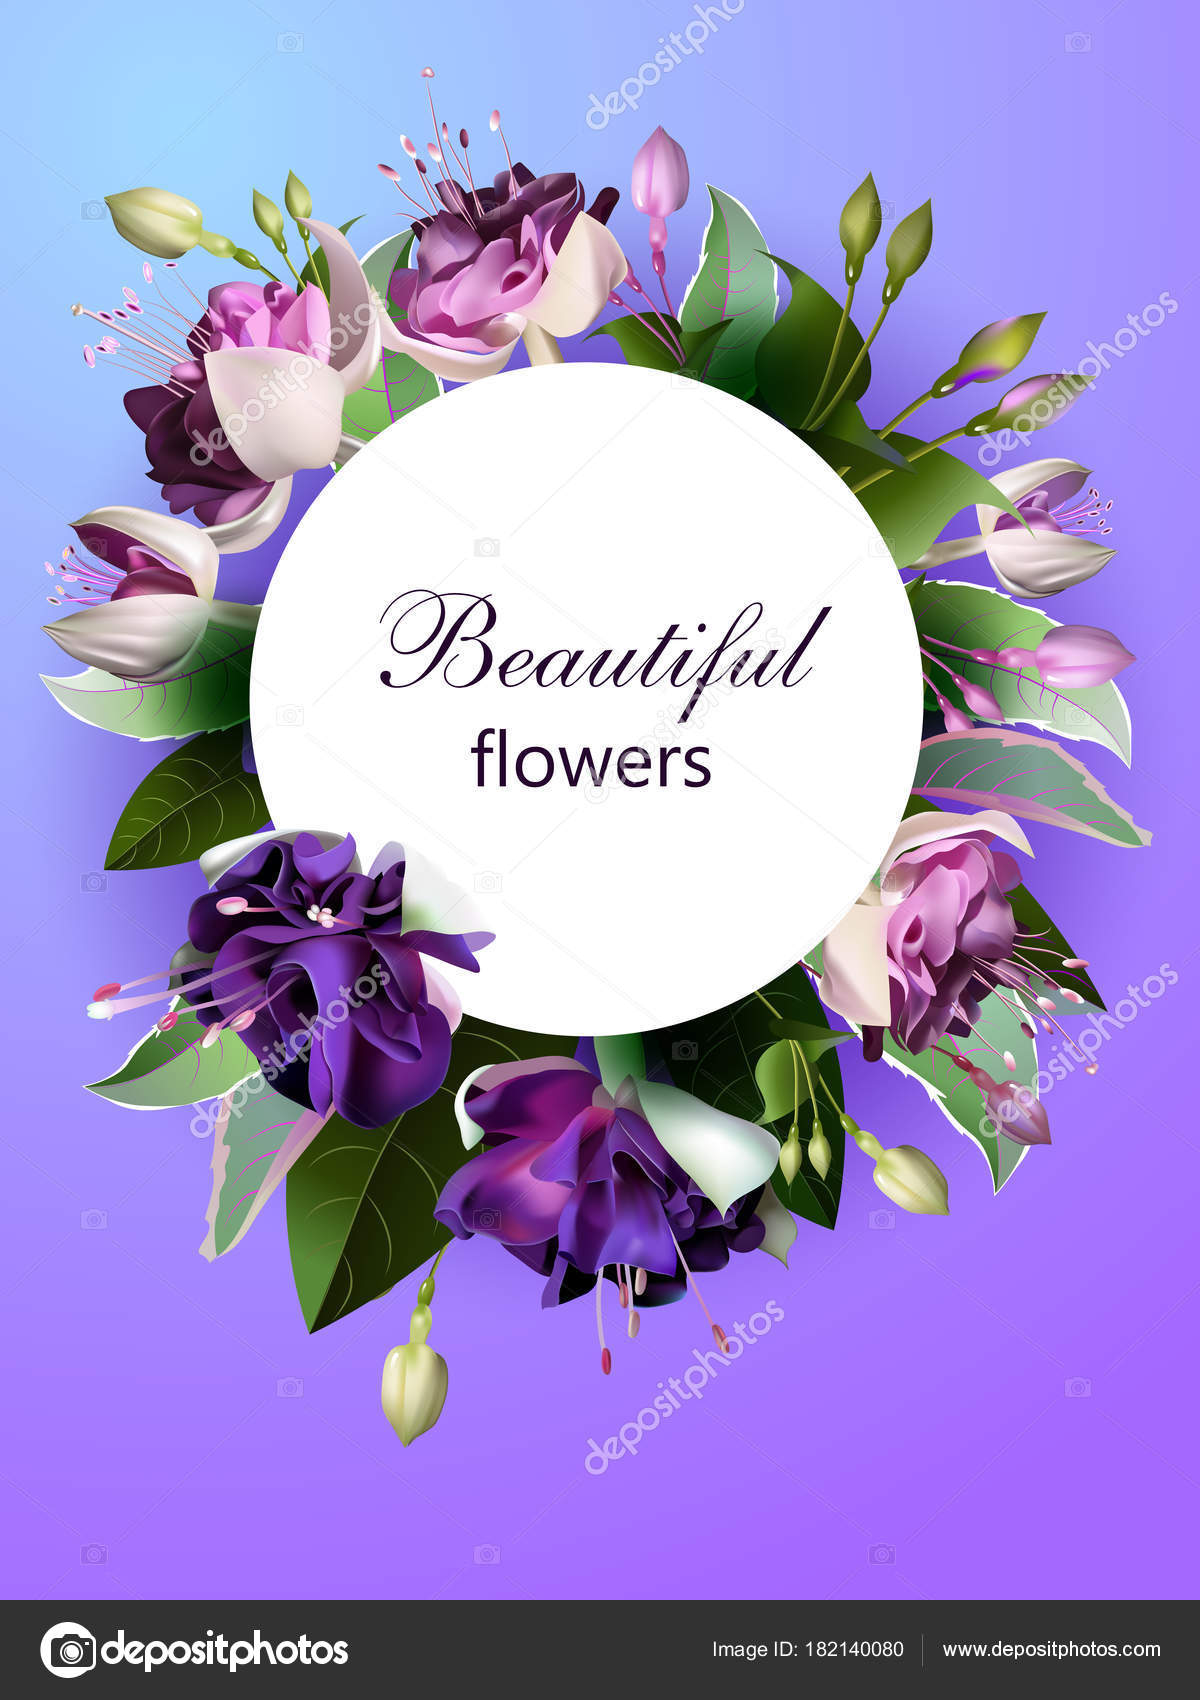 Wedding greetings wishes greeting card flower arrangement stock wedding greetings wishes greeting card flower arrangement stock vector m4hsunfo